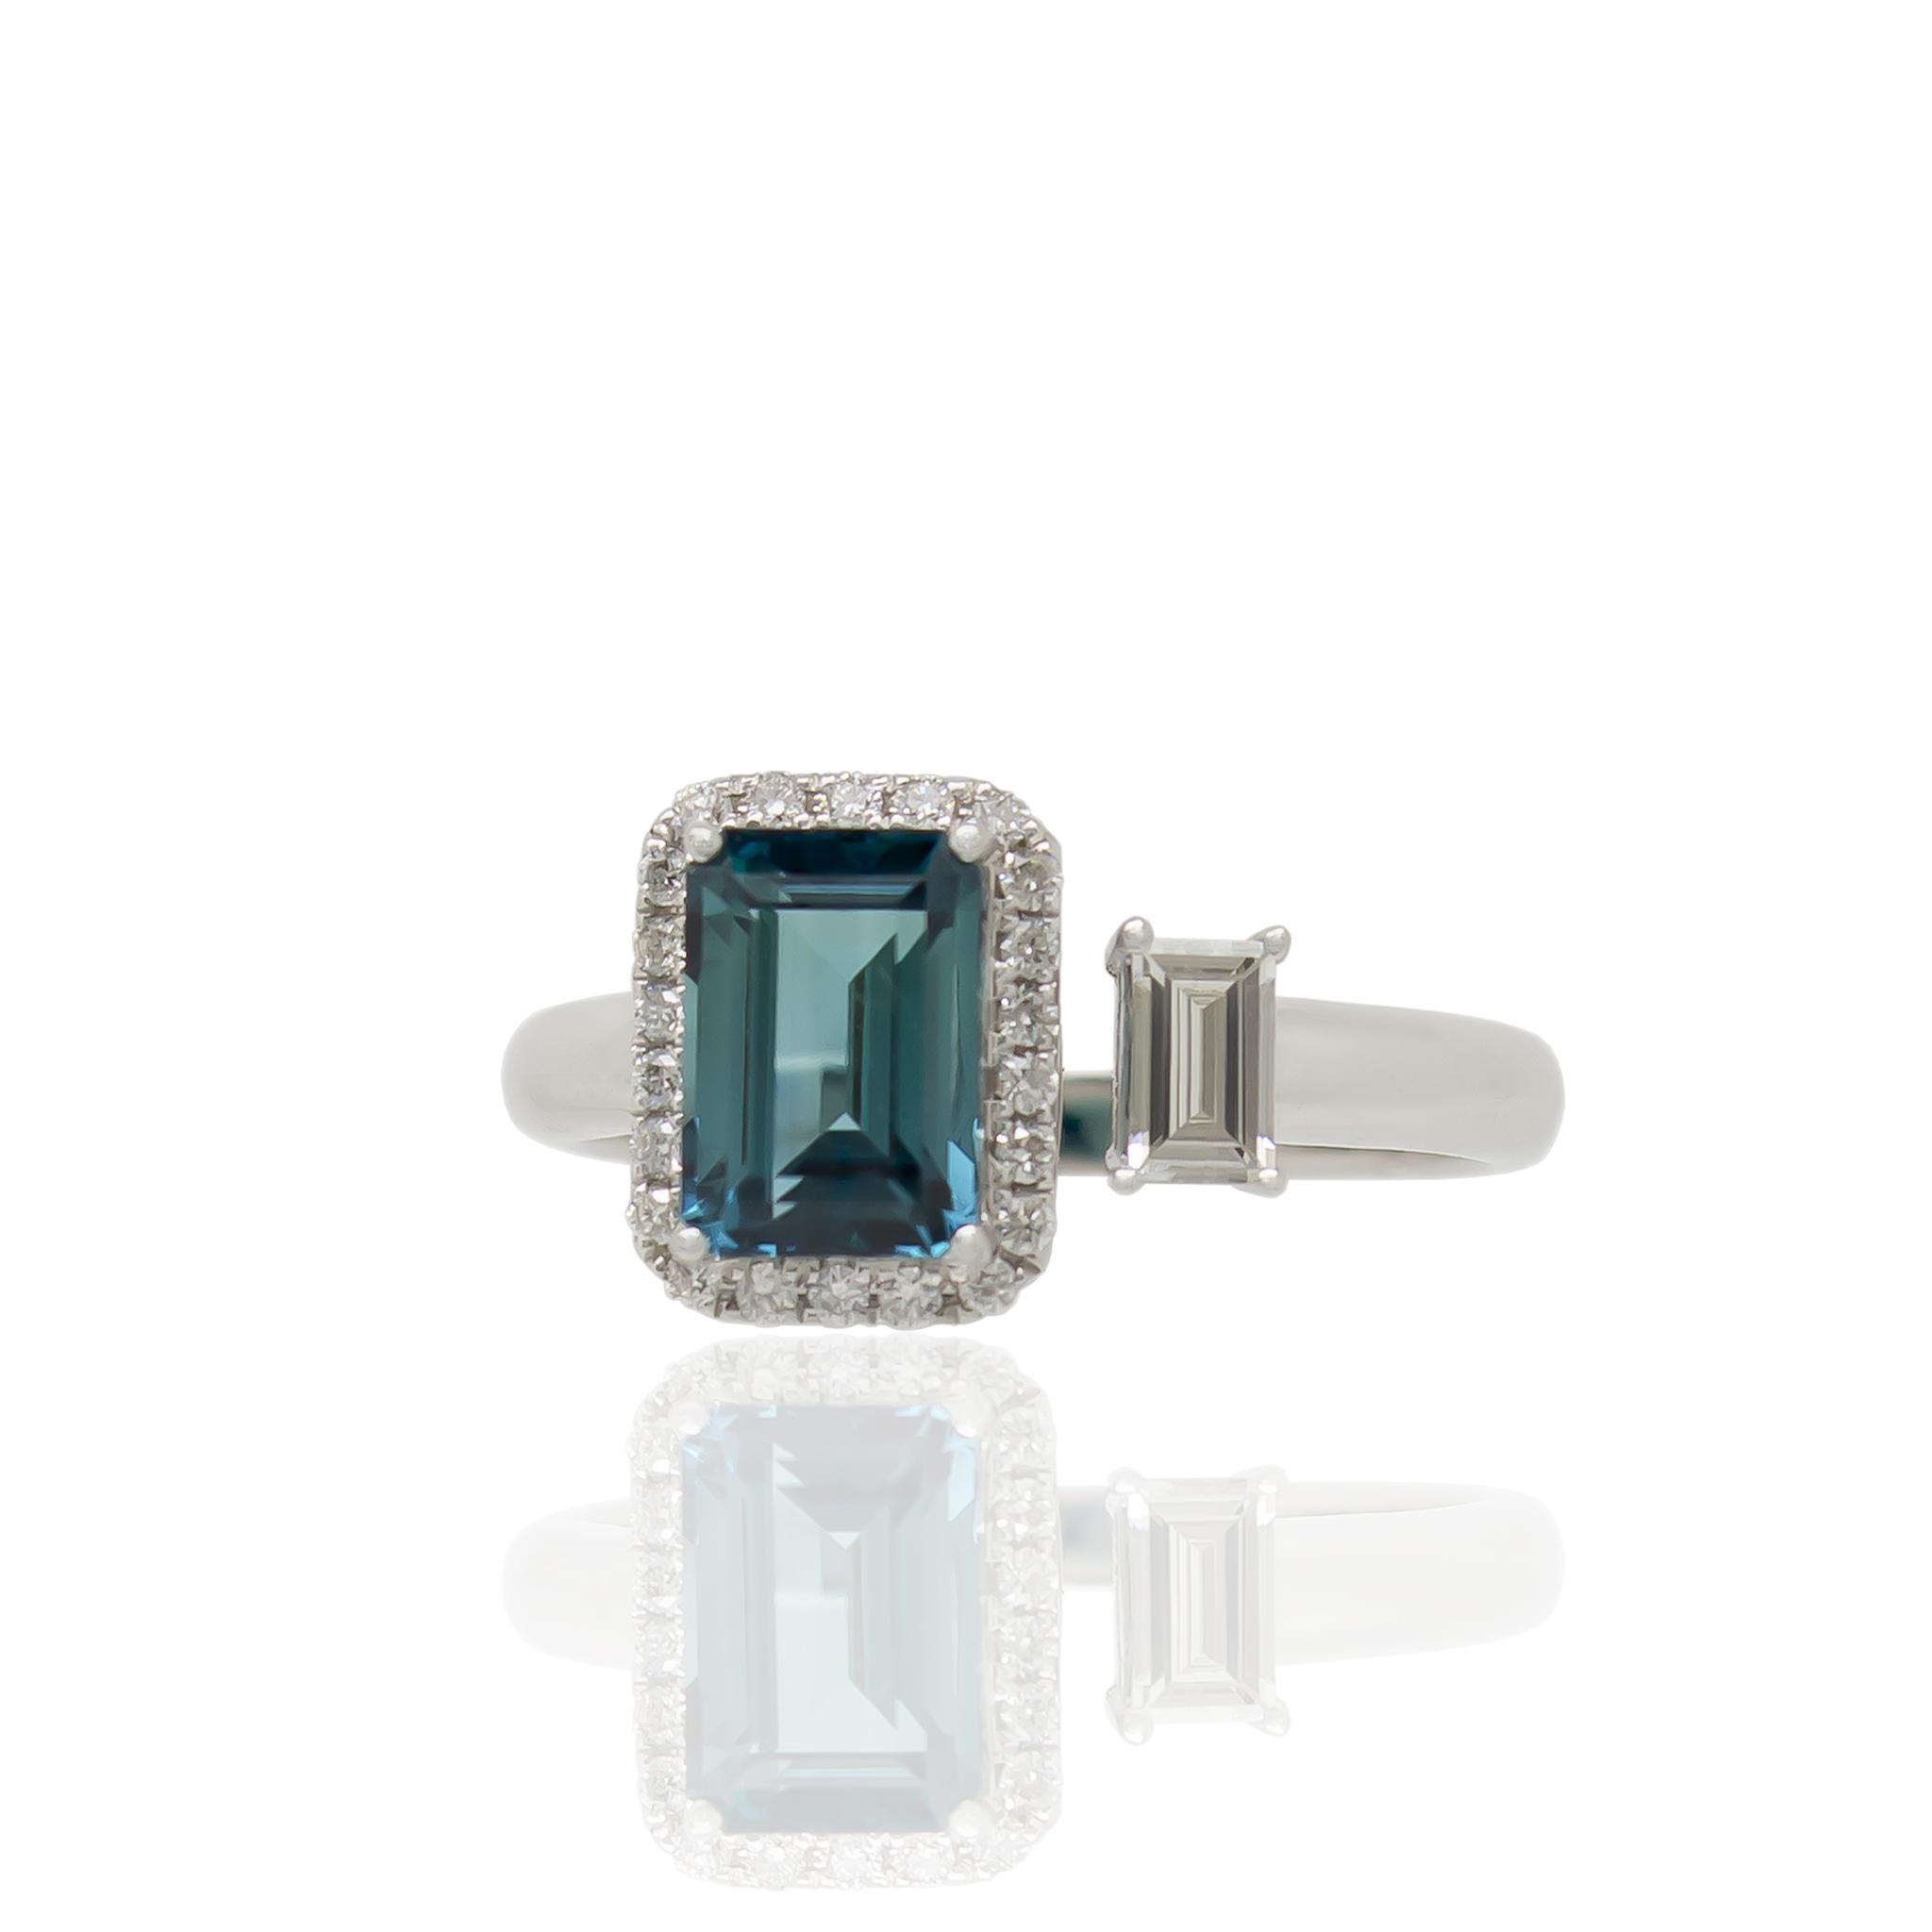 Noxy aqua ring white